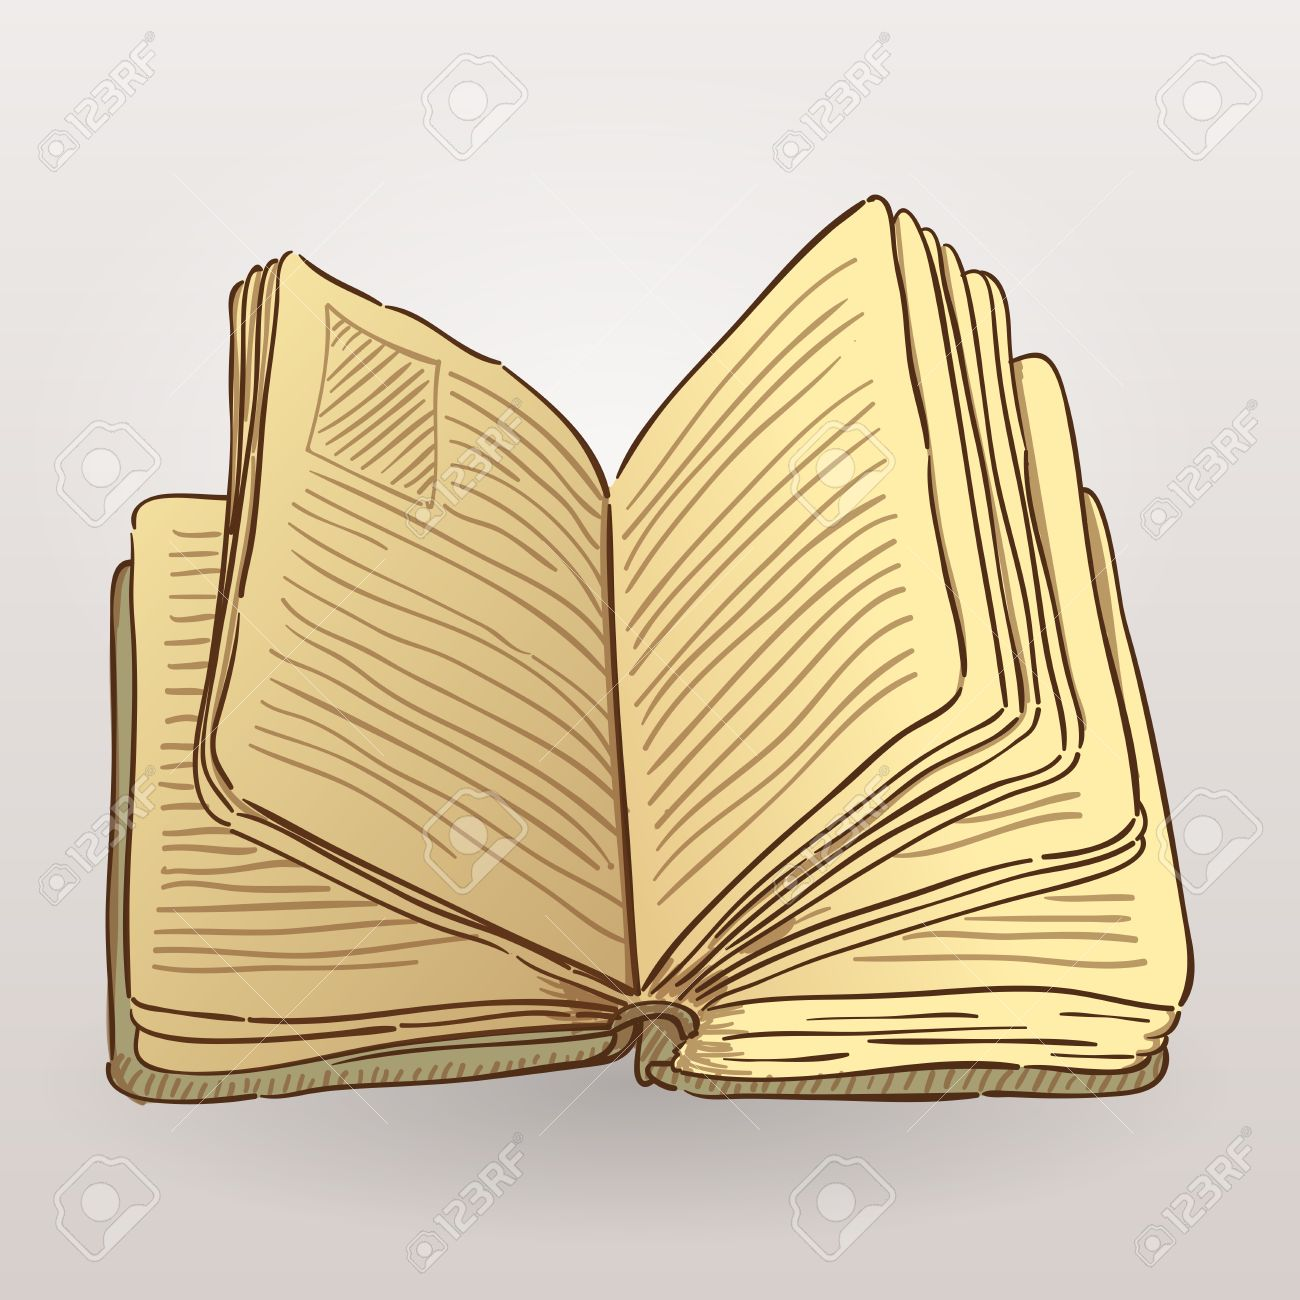 Book Illustration Stock Vector - 17924526